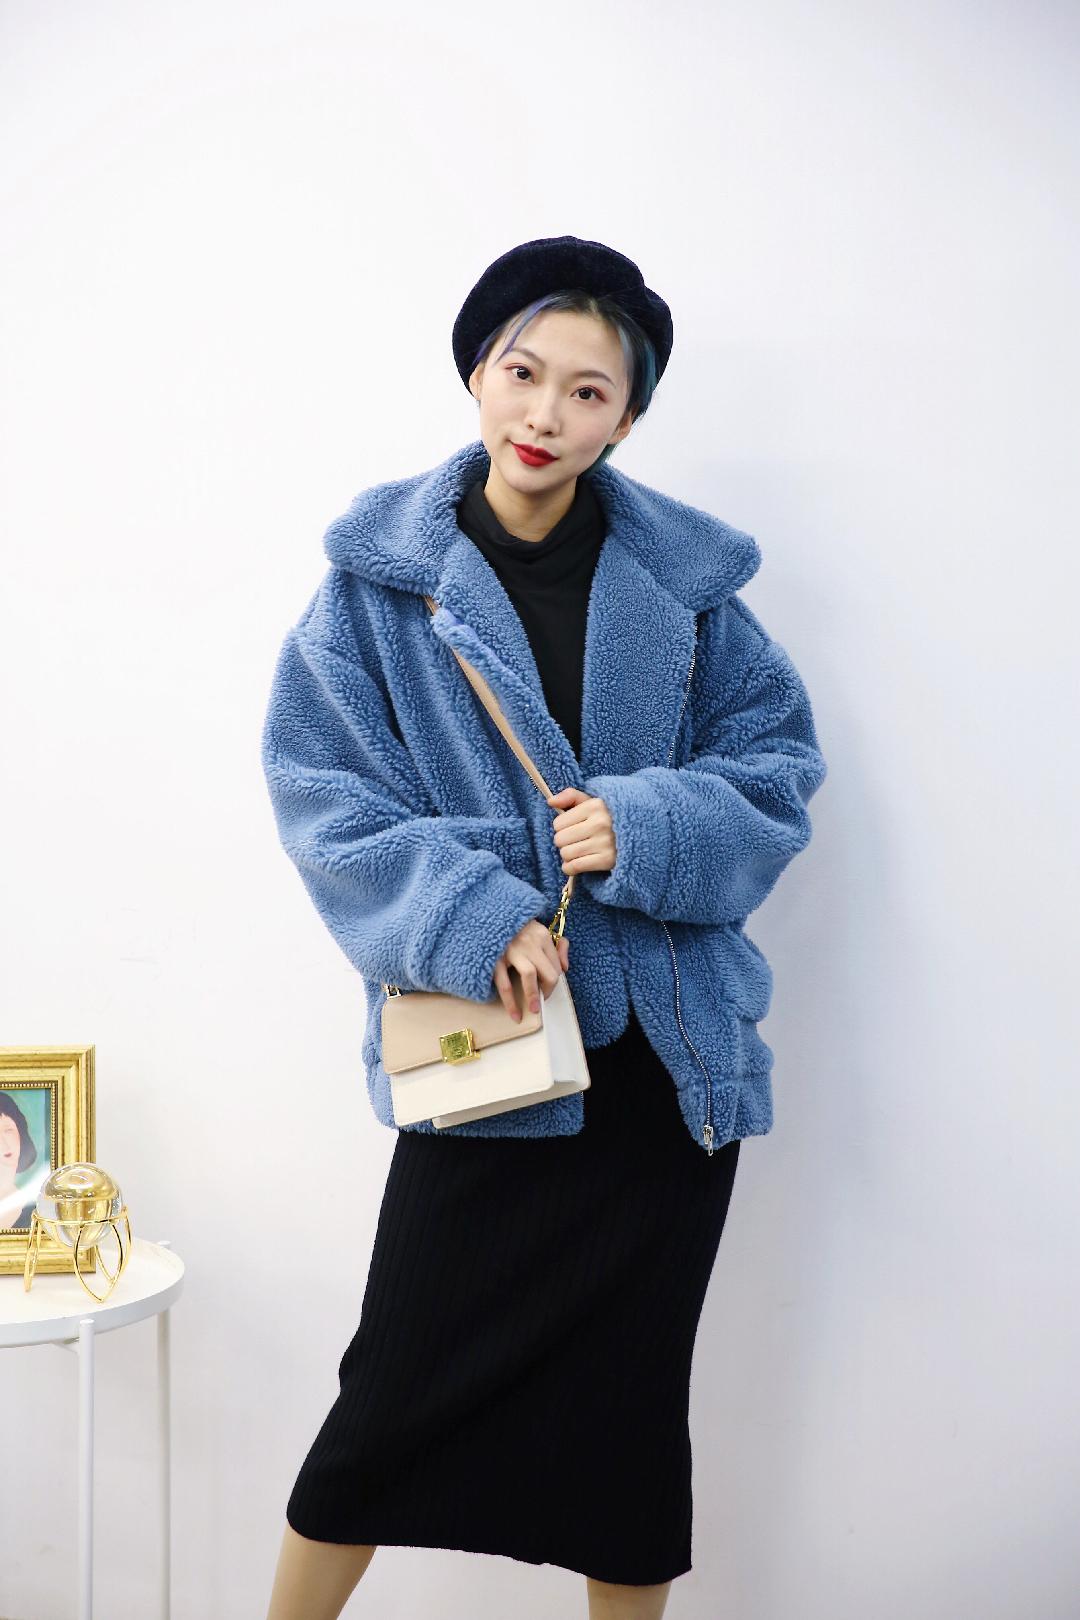 #K-FASHION,韩国品牌在线试穿!# 💙CHAEBUBBLE 蓝灰色的羊羔毛外套~颜色足够美腻 上身气质upup 💙黑色打底上衣是不会出错的选择 外套很厚实的情况下内搭需要穿的轻薄一点才不会显得整个人很胖噢 💙Hellosweety的针织包臀裙超级亲肤 很舒适 版型也很好噢